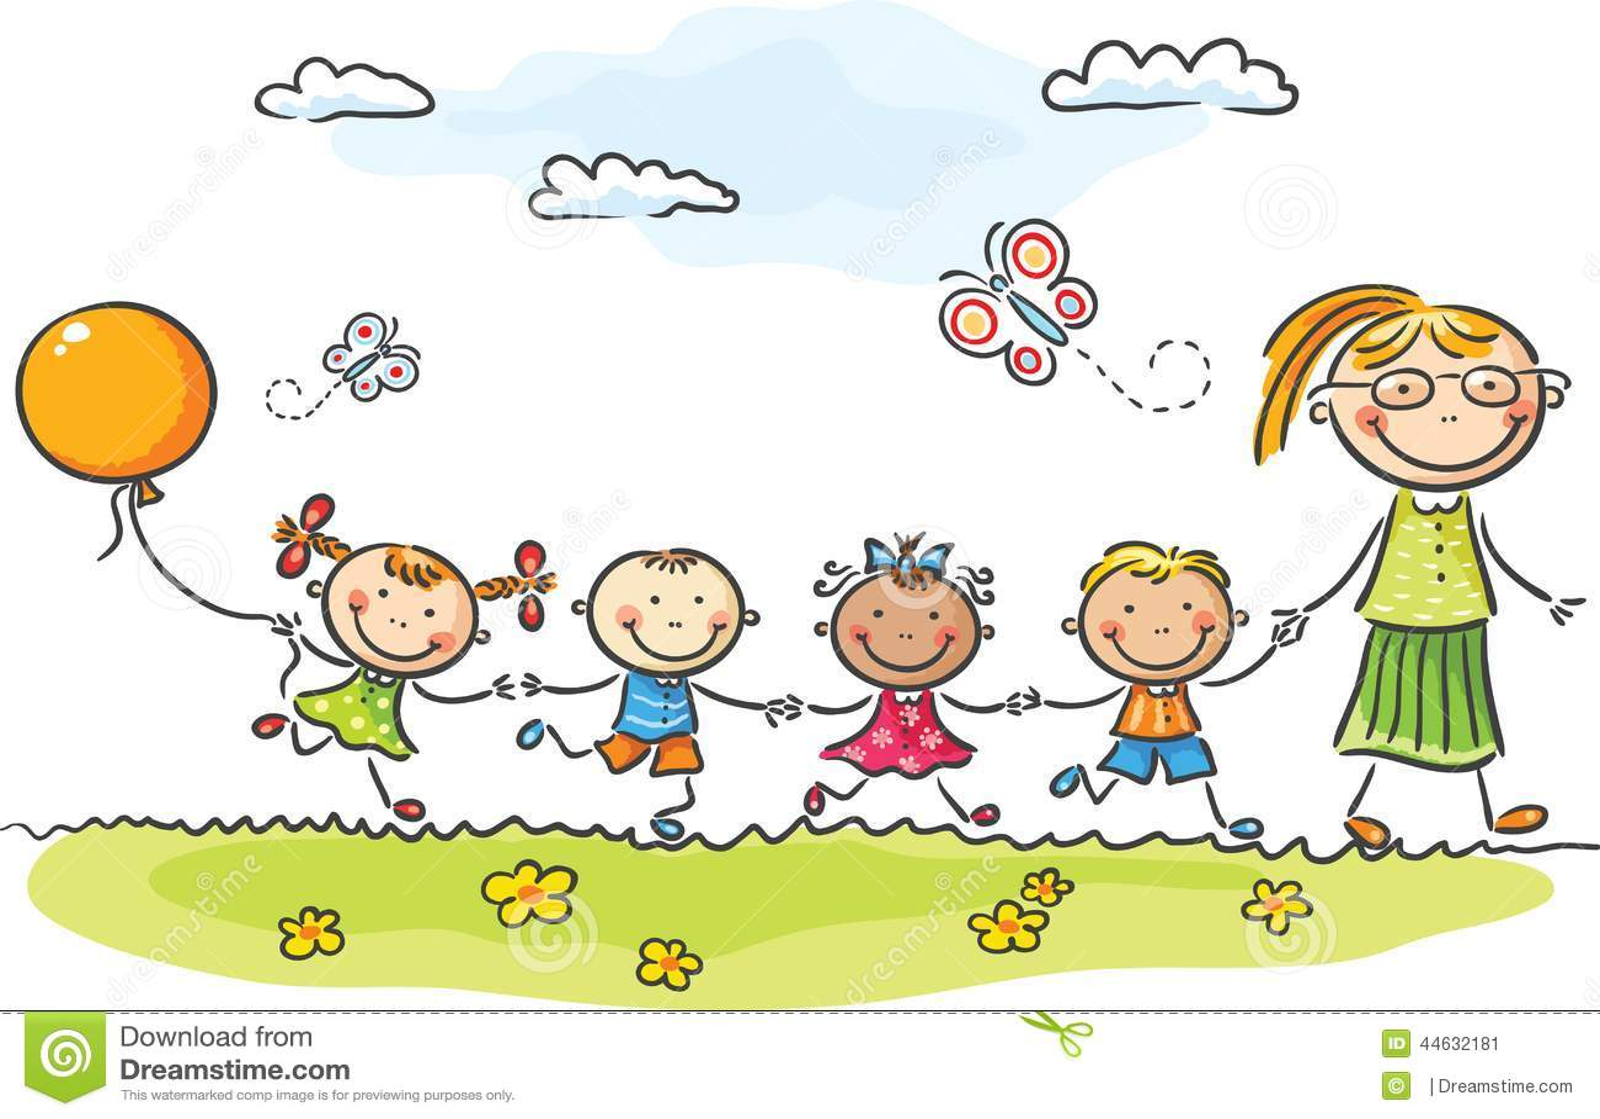 Kindergarten Stock Illustrationen, Vektors, & Klipart – (58,517 ...